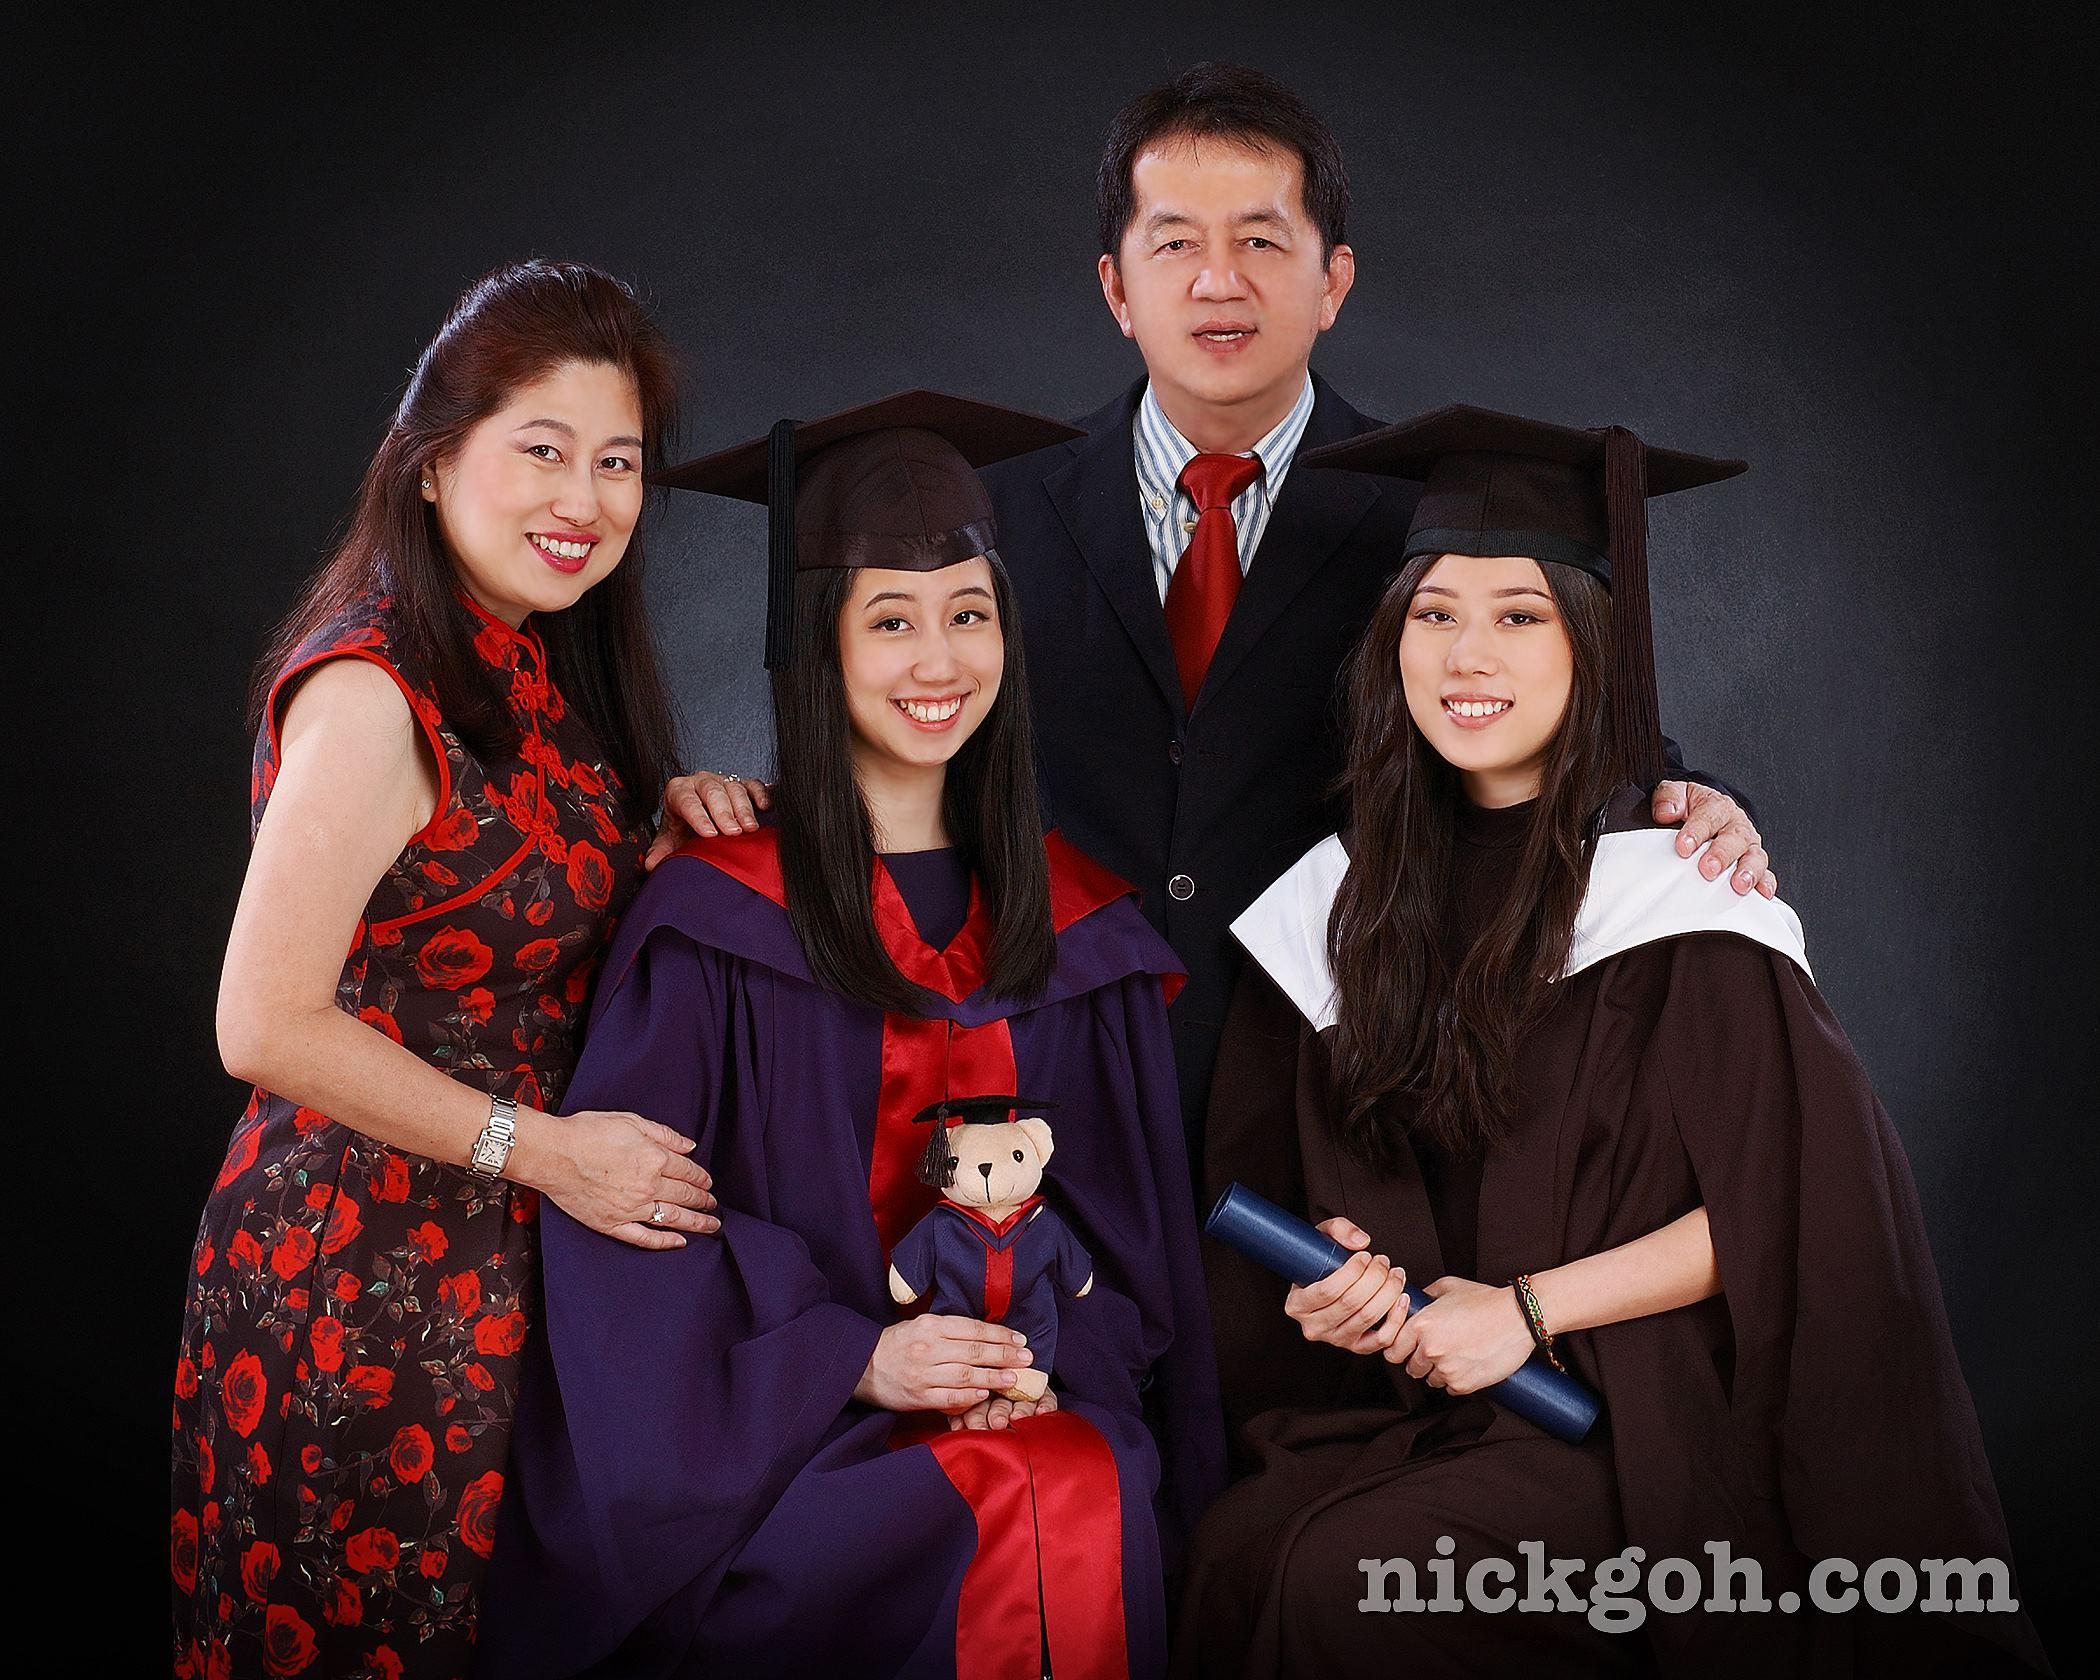 Graduation Family Photography  - Nick Goh Photo Studio, Singapore